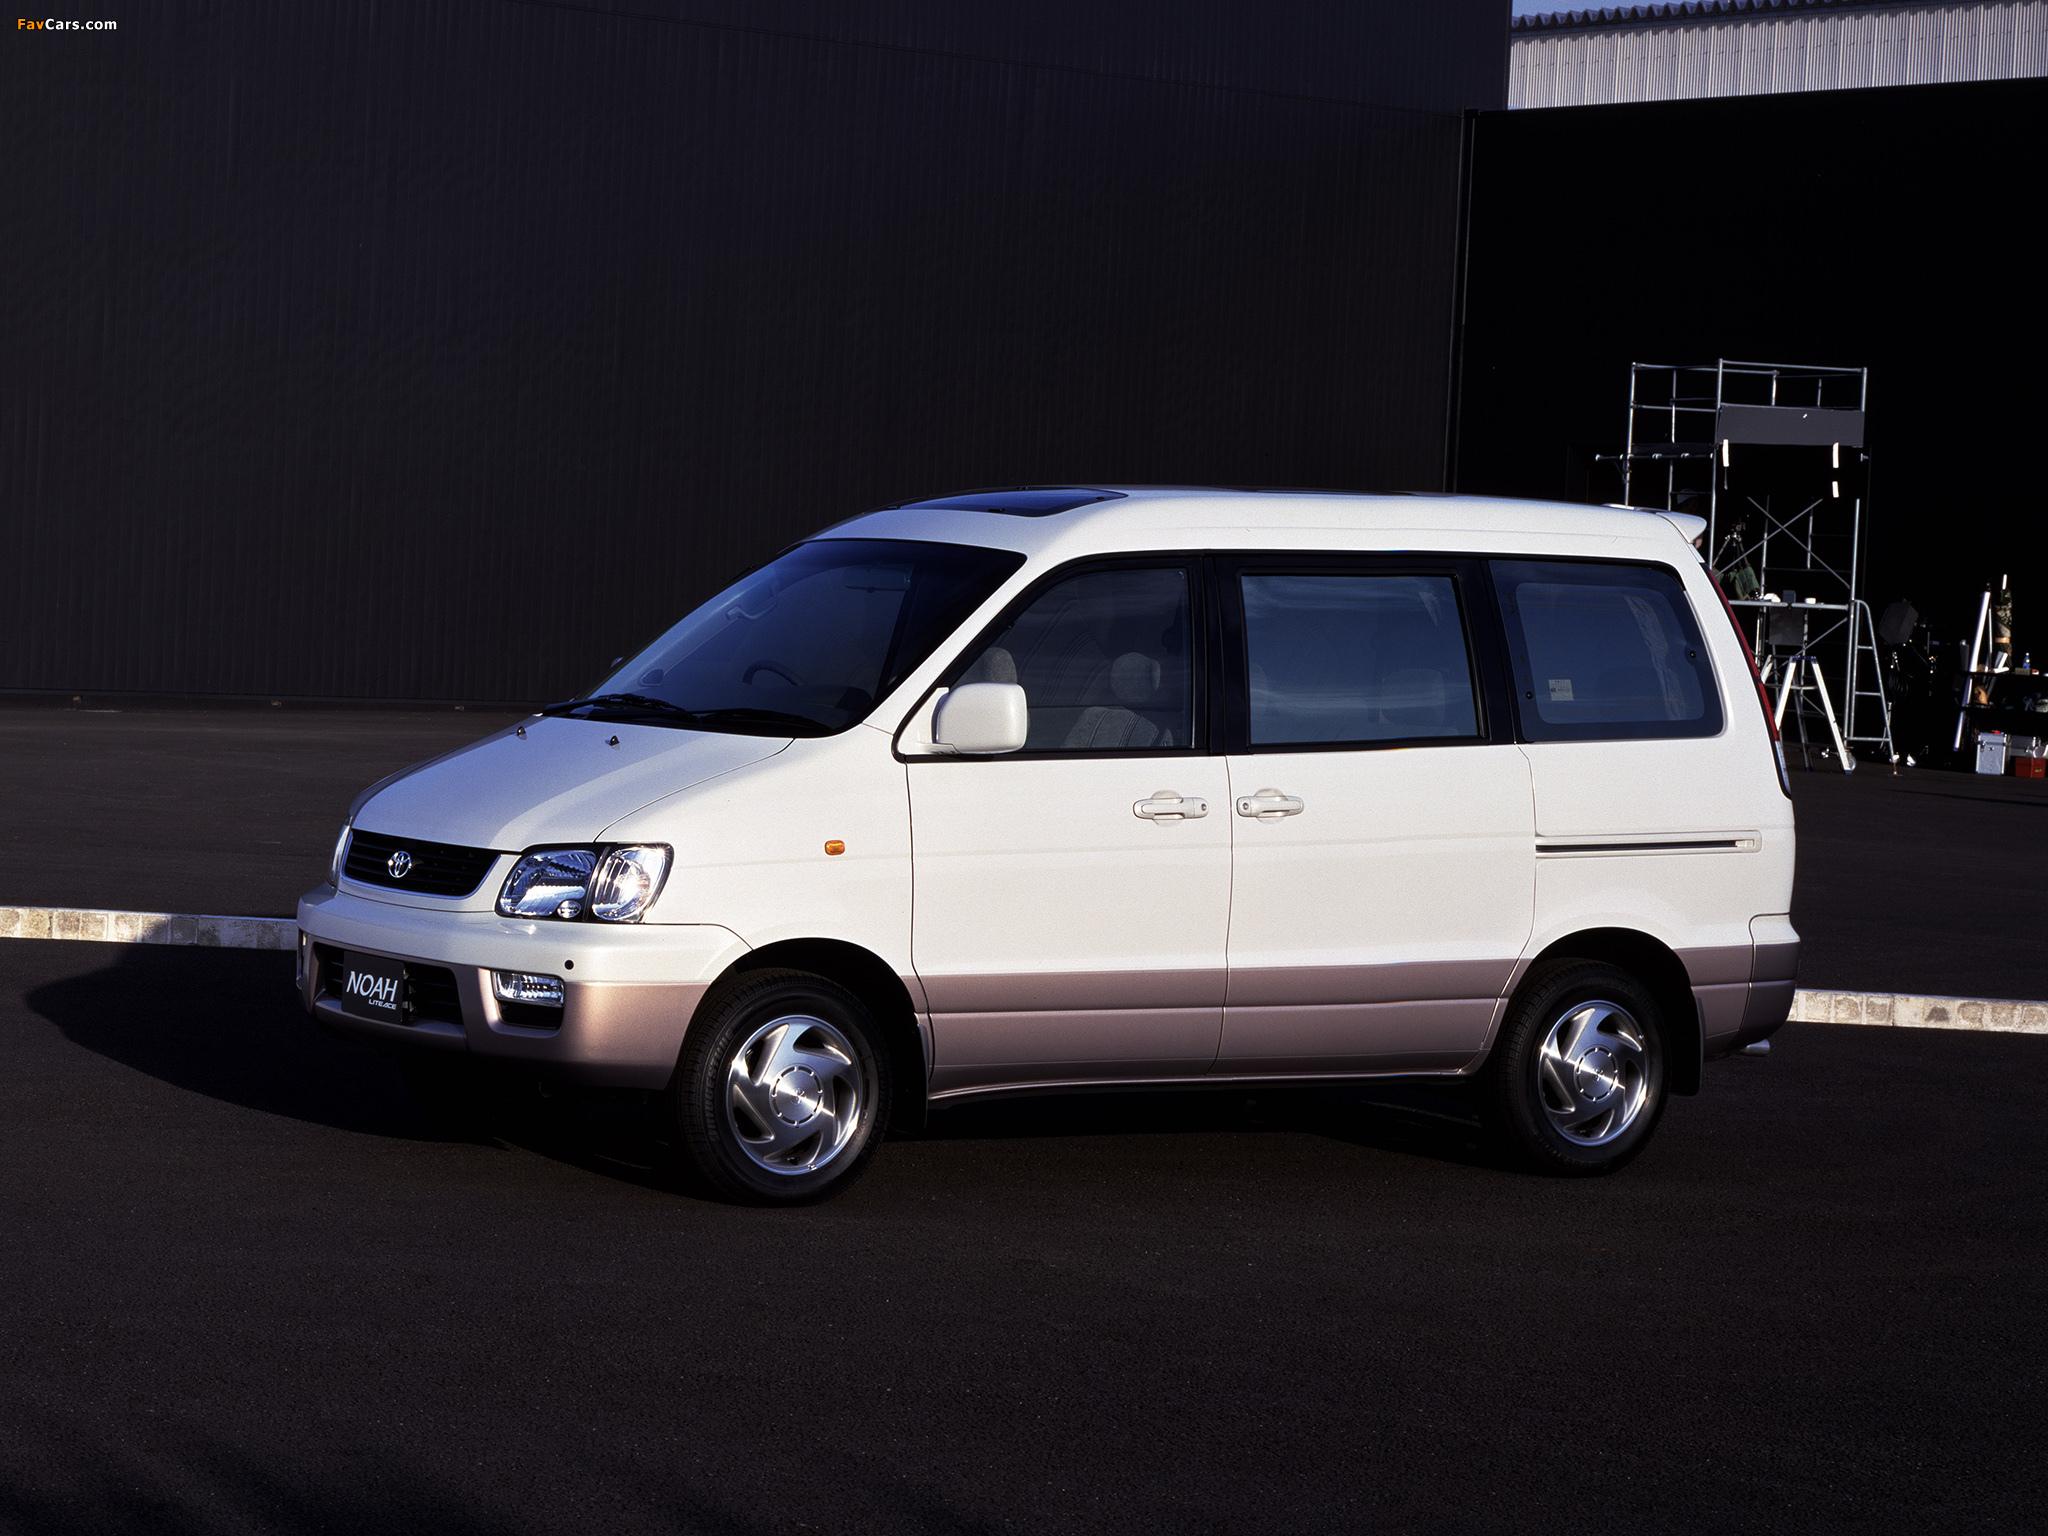 Toyota LiteAce Noah 2WD (R40G) 1996 photos (2048 x 1536)